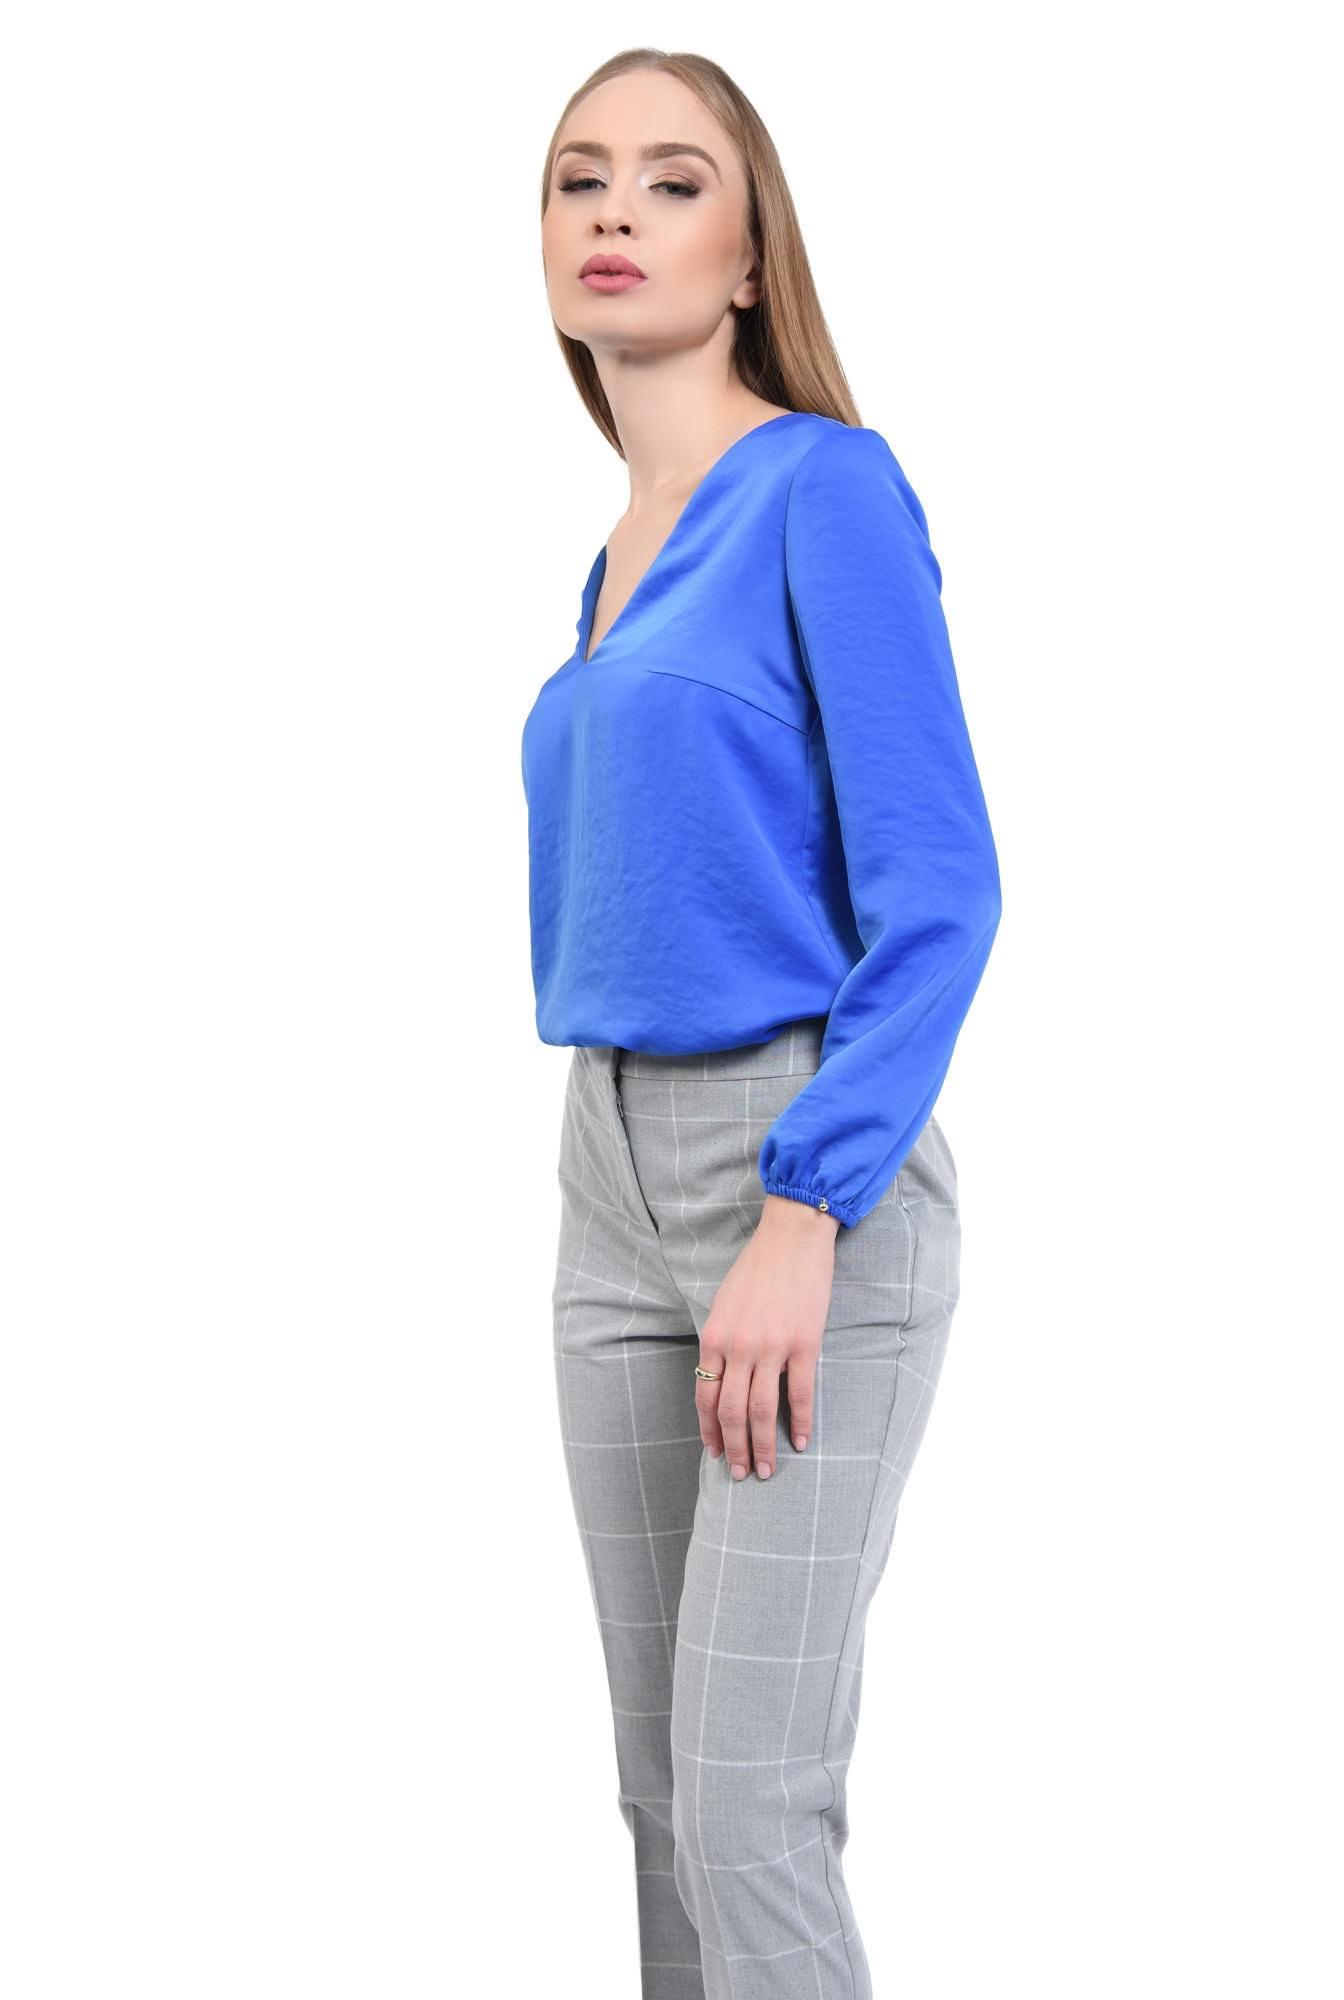 0 - Pantaloni casual, imprimeu